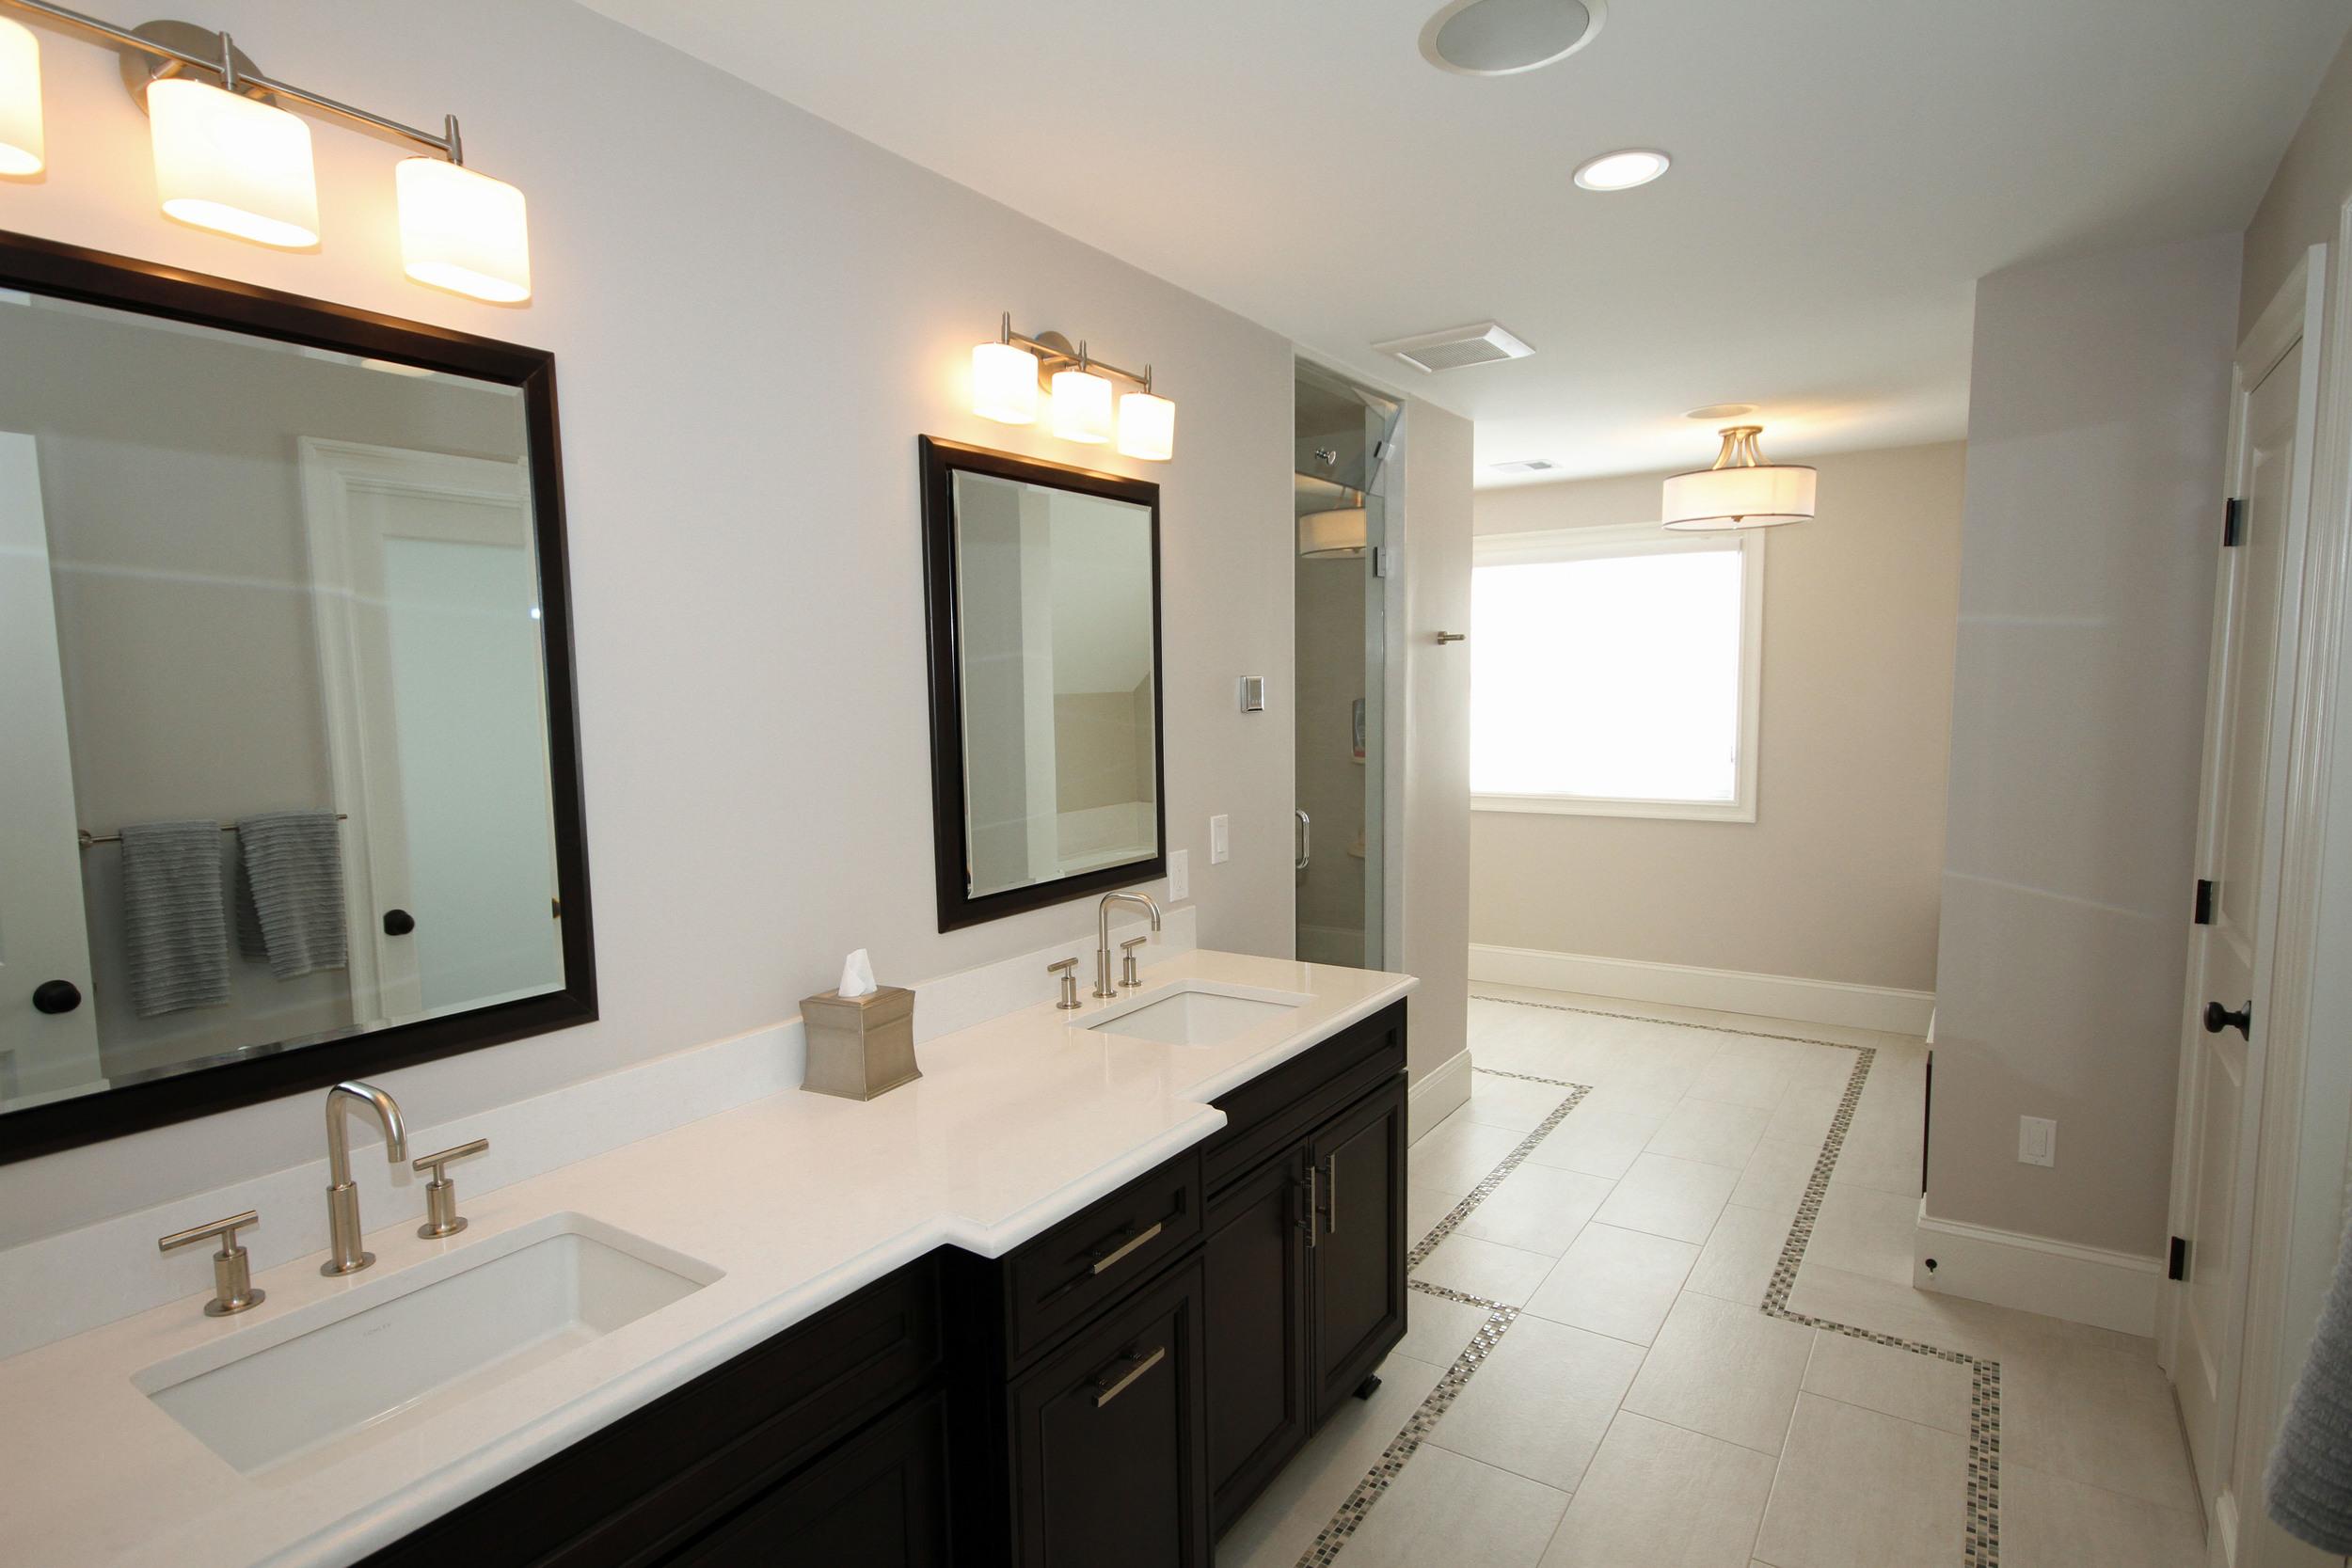 master bathroom sinks 1.jpg